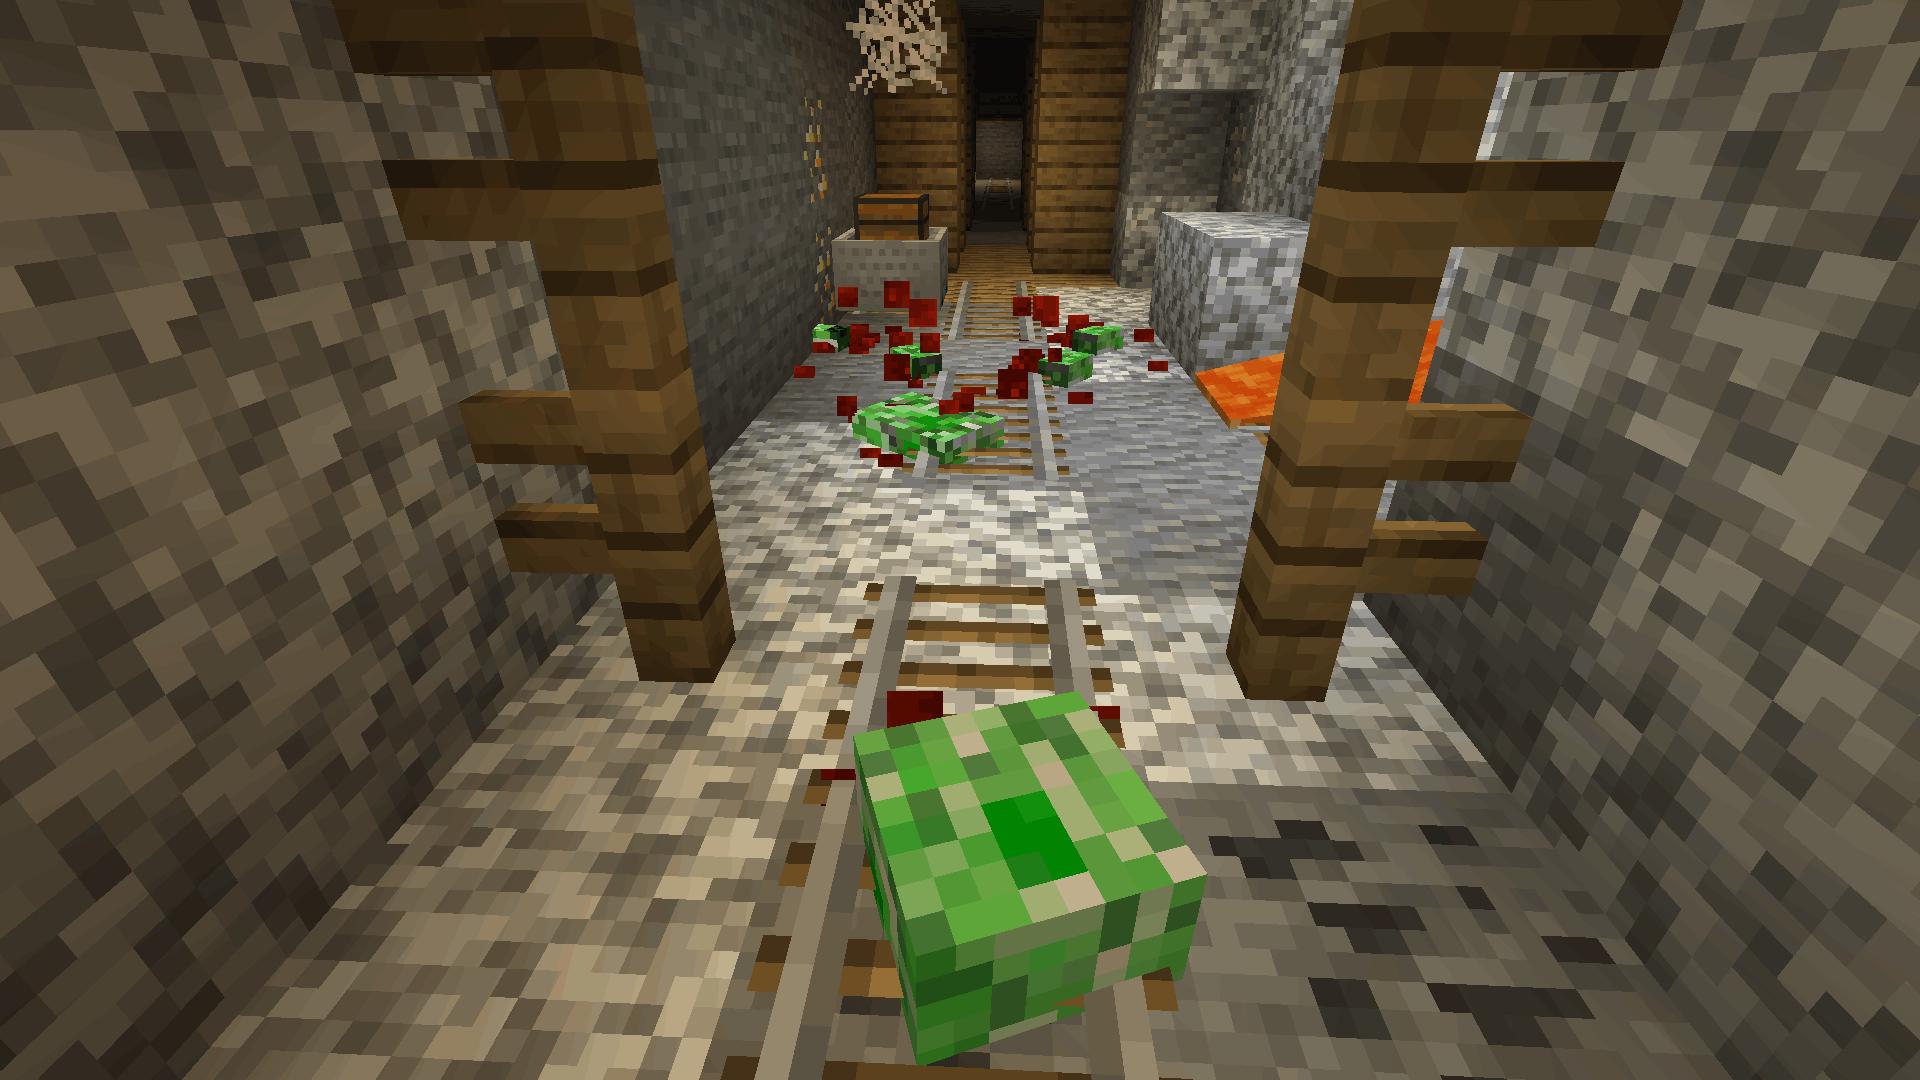 Dead creeper in mineshaft